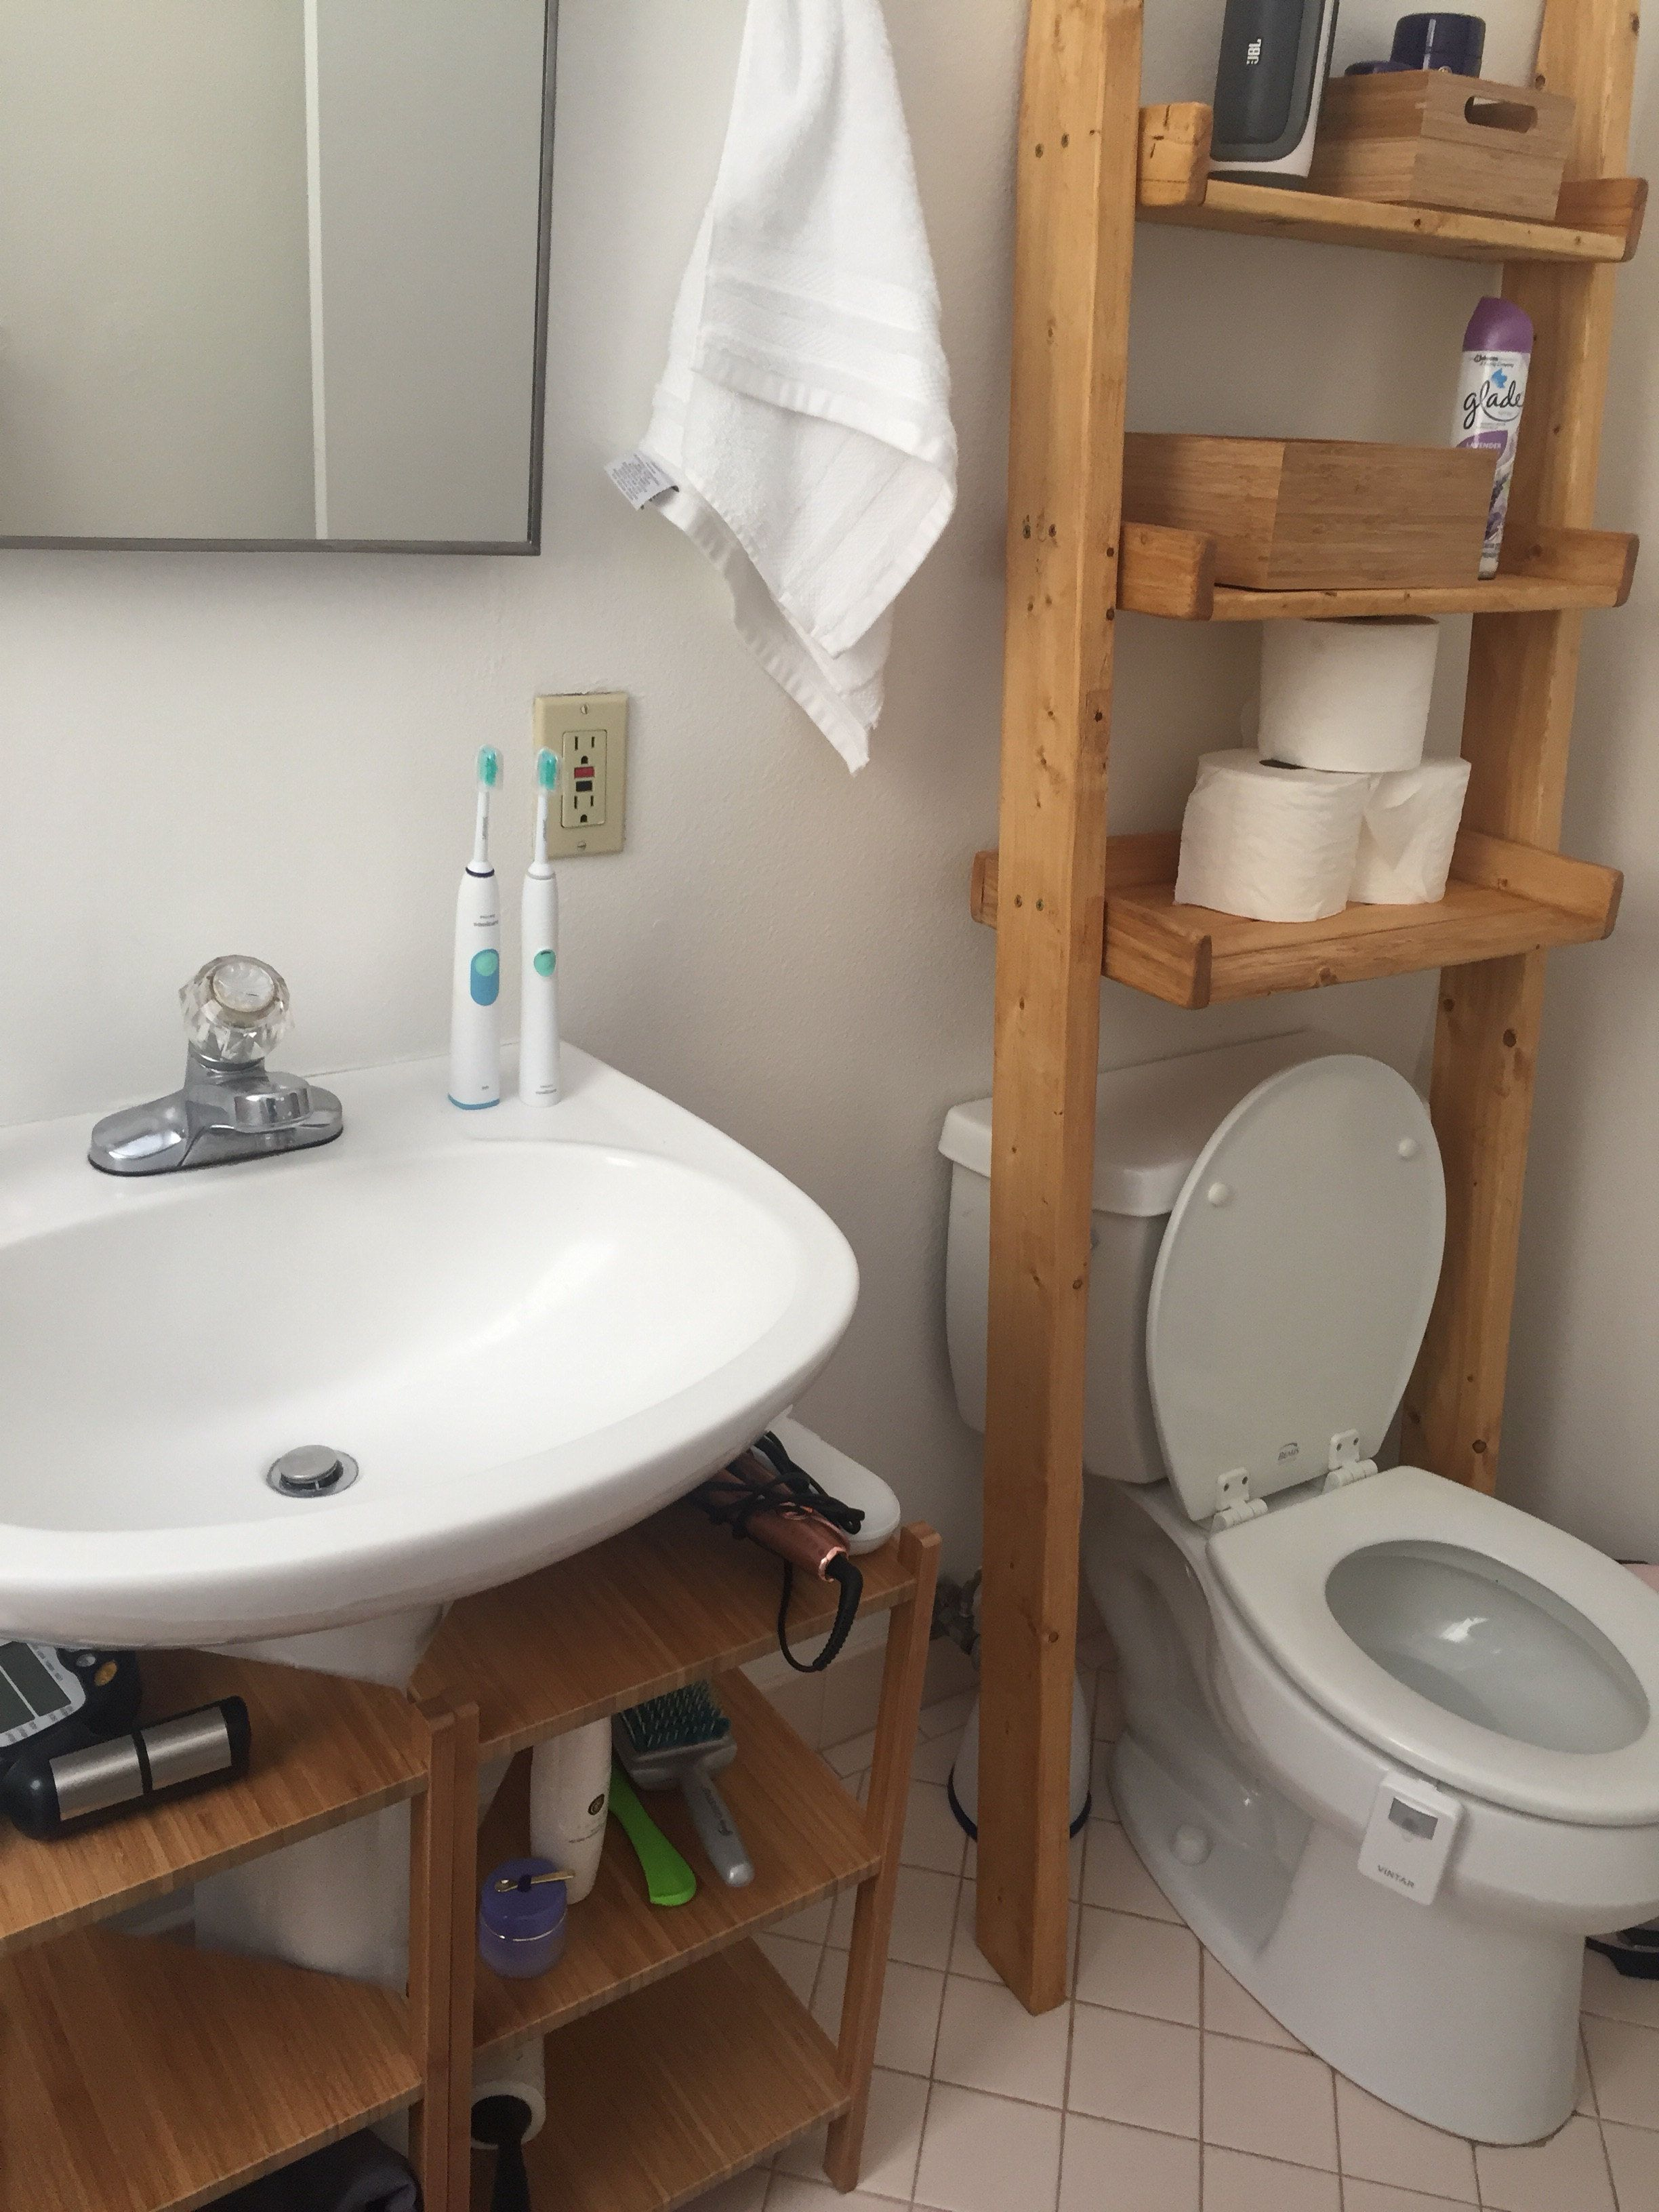 Over The Toilet Ladder Shelf, Choose Color Stain/paint, Bathroom Storage,  Leaning Ladder Shelf, Bathroom Ladder, Wood Shelf, Ladder Shelf